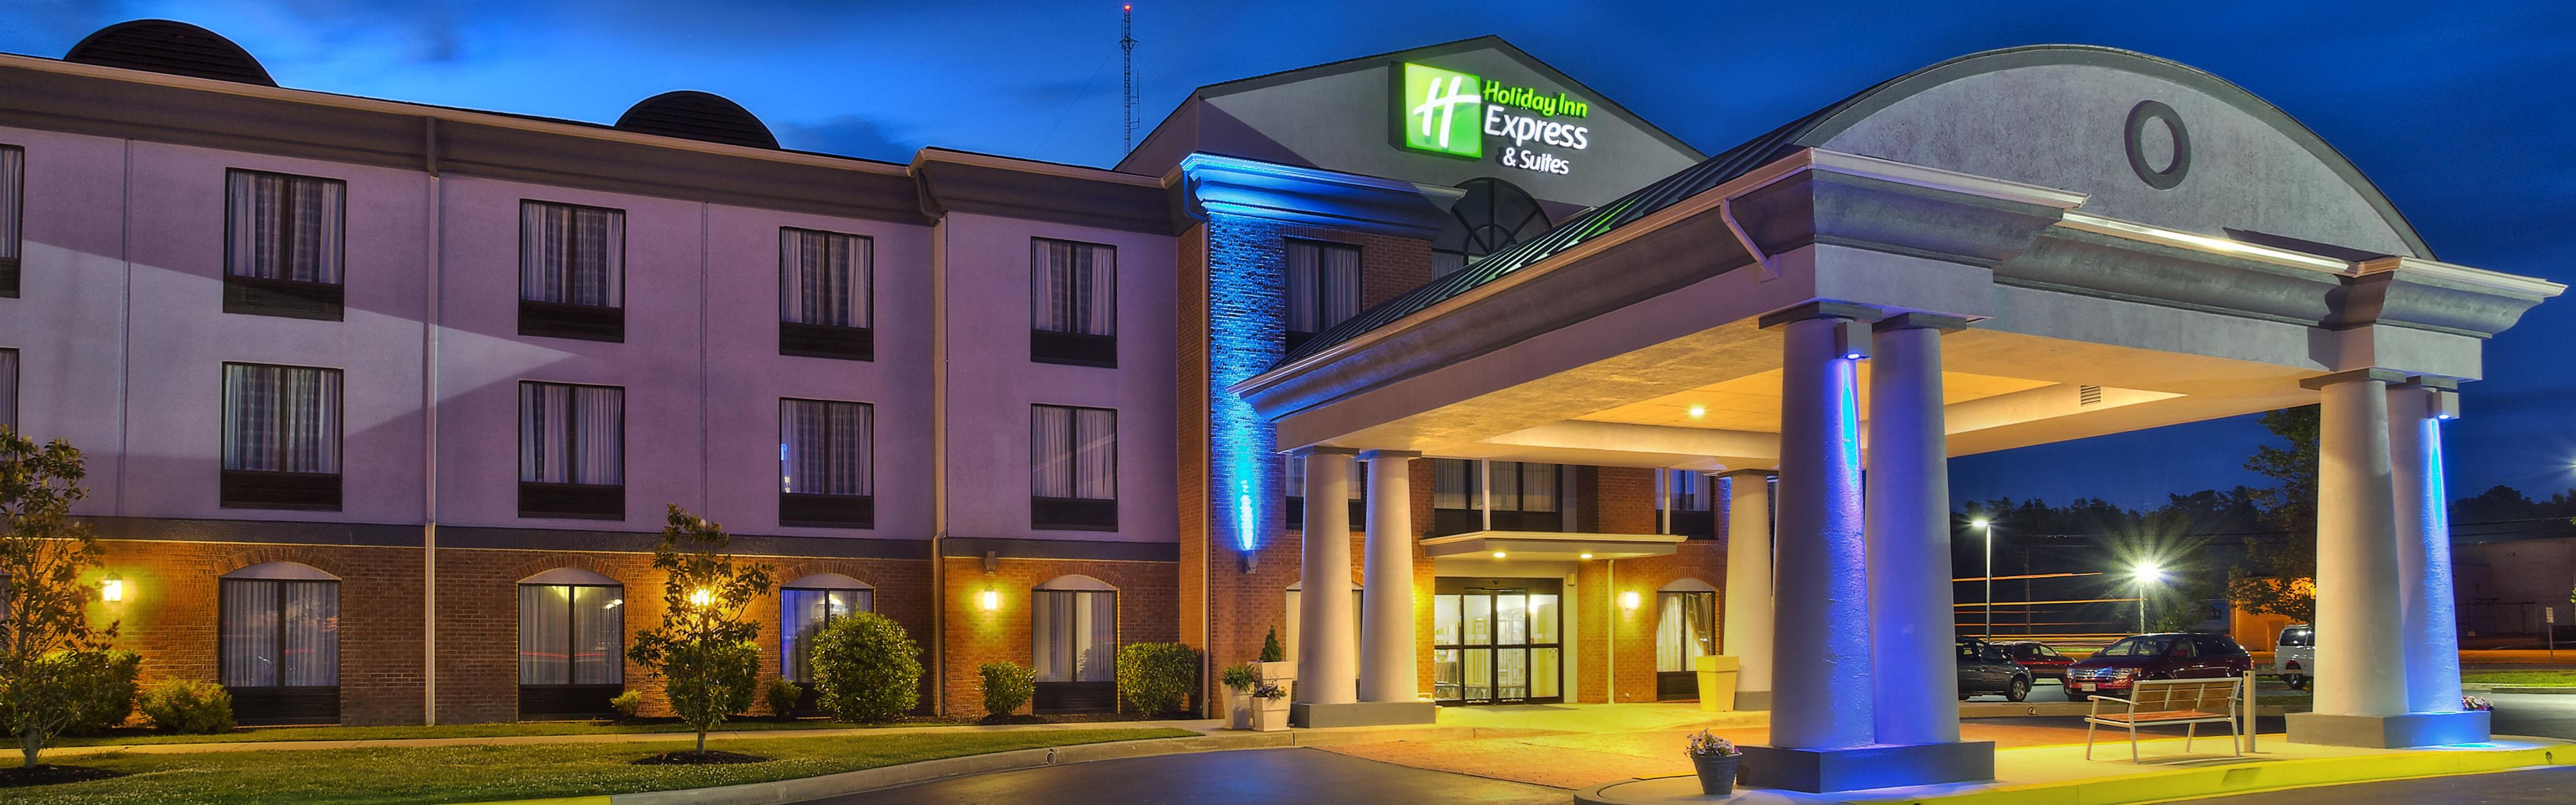 Hotels Dover Delaware Area